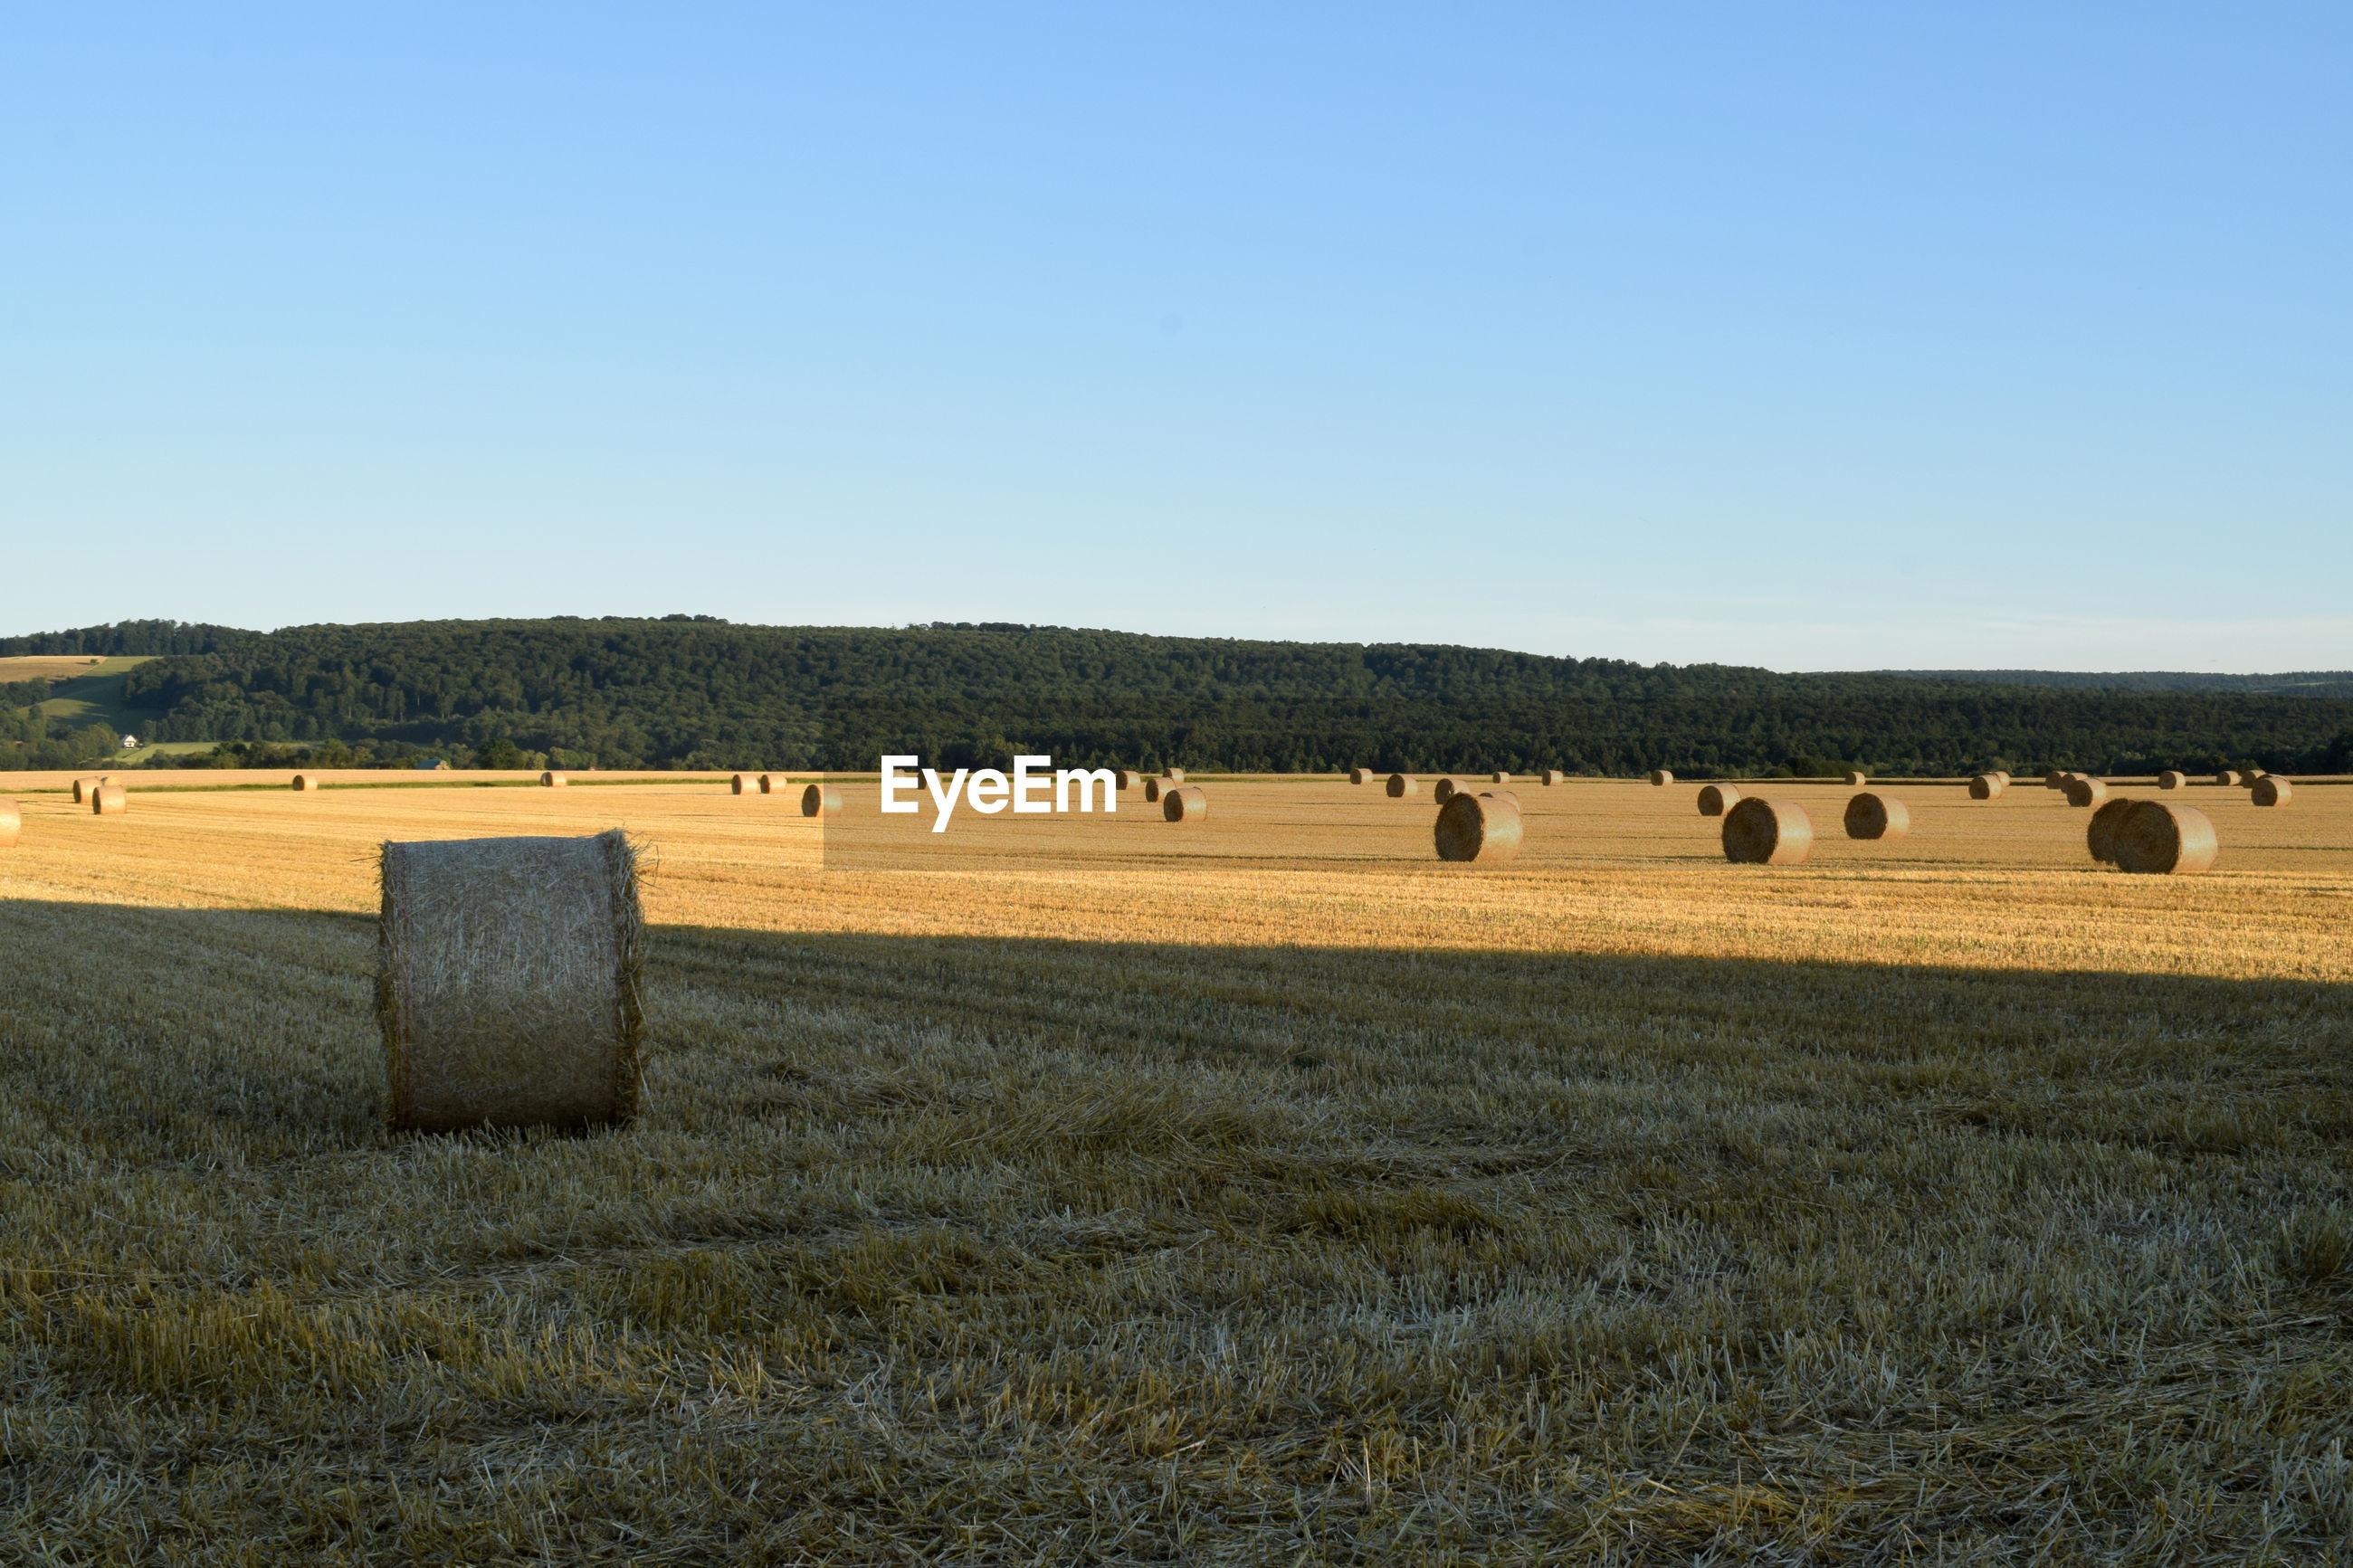 HAY BALES ON FIELD AGAINST CLEAR SKY AGAINST BLUE FARM